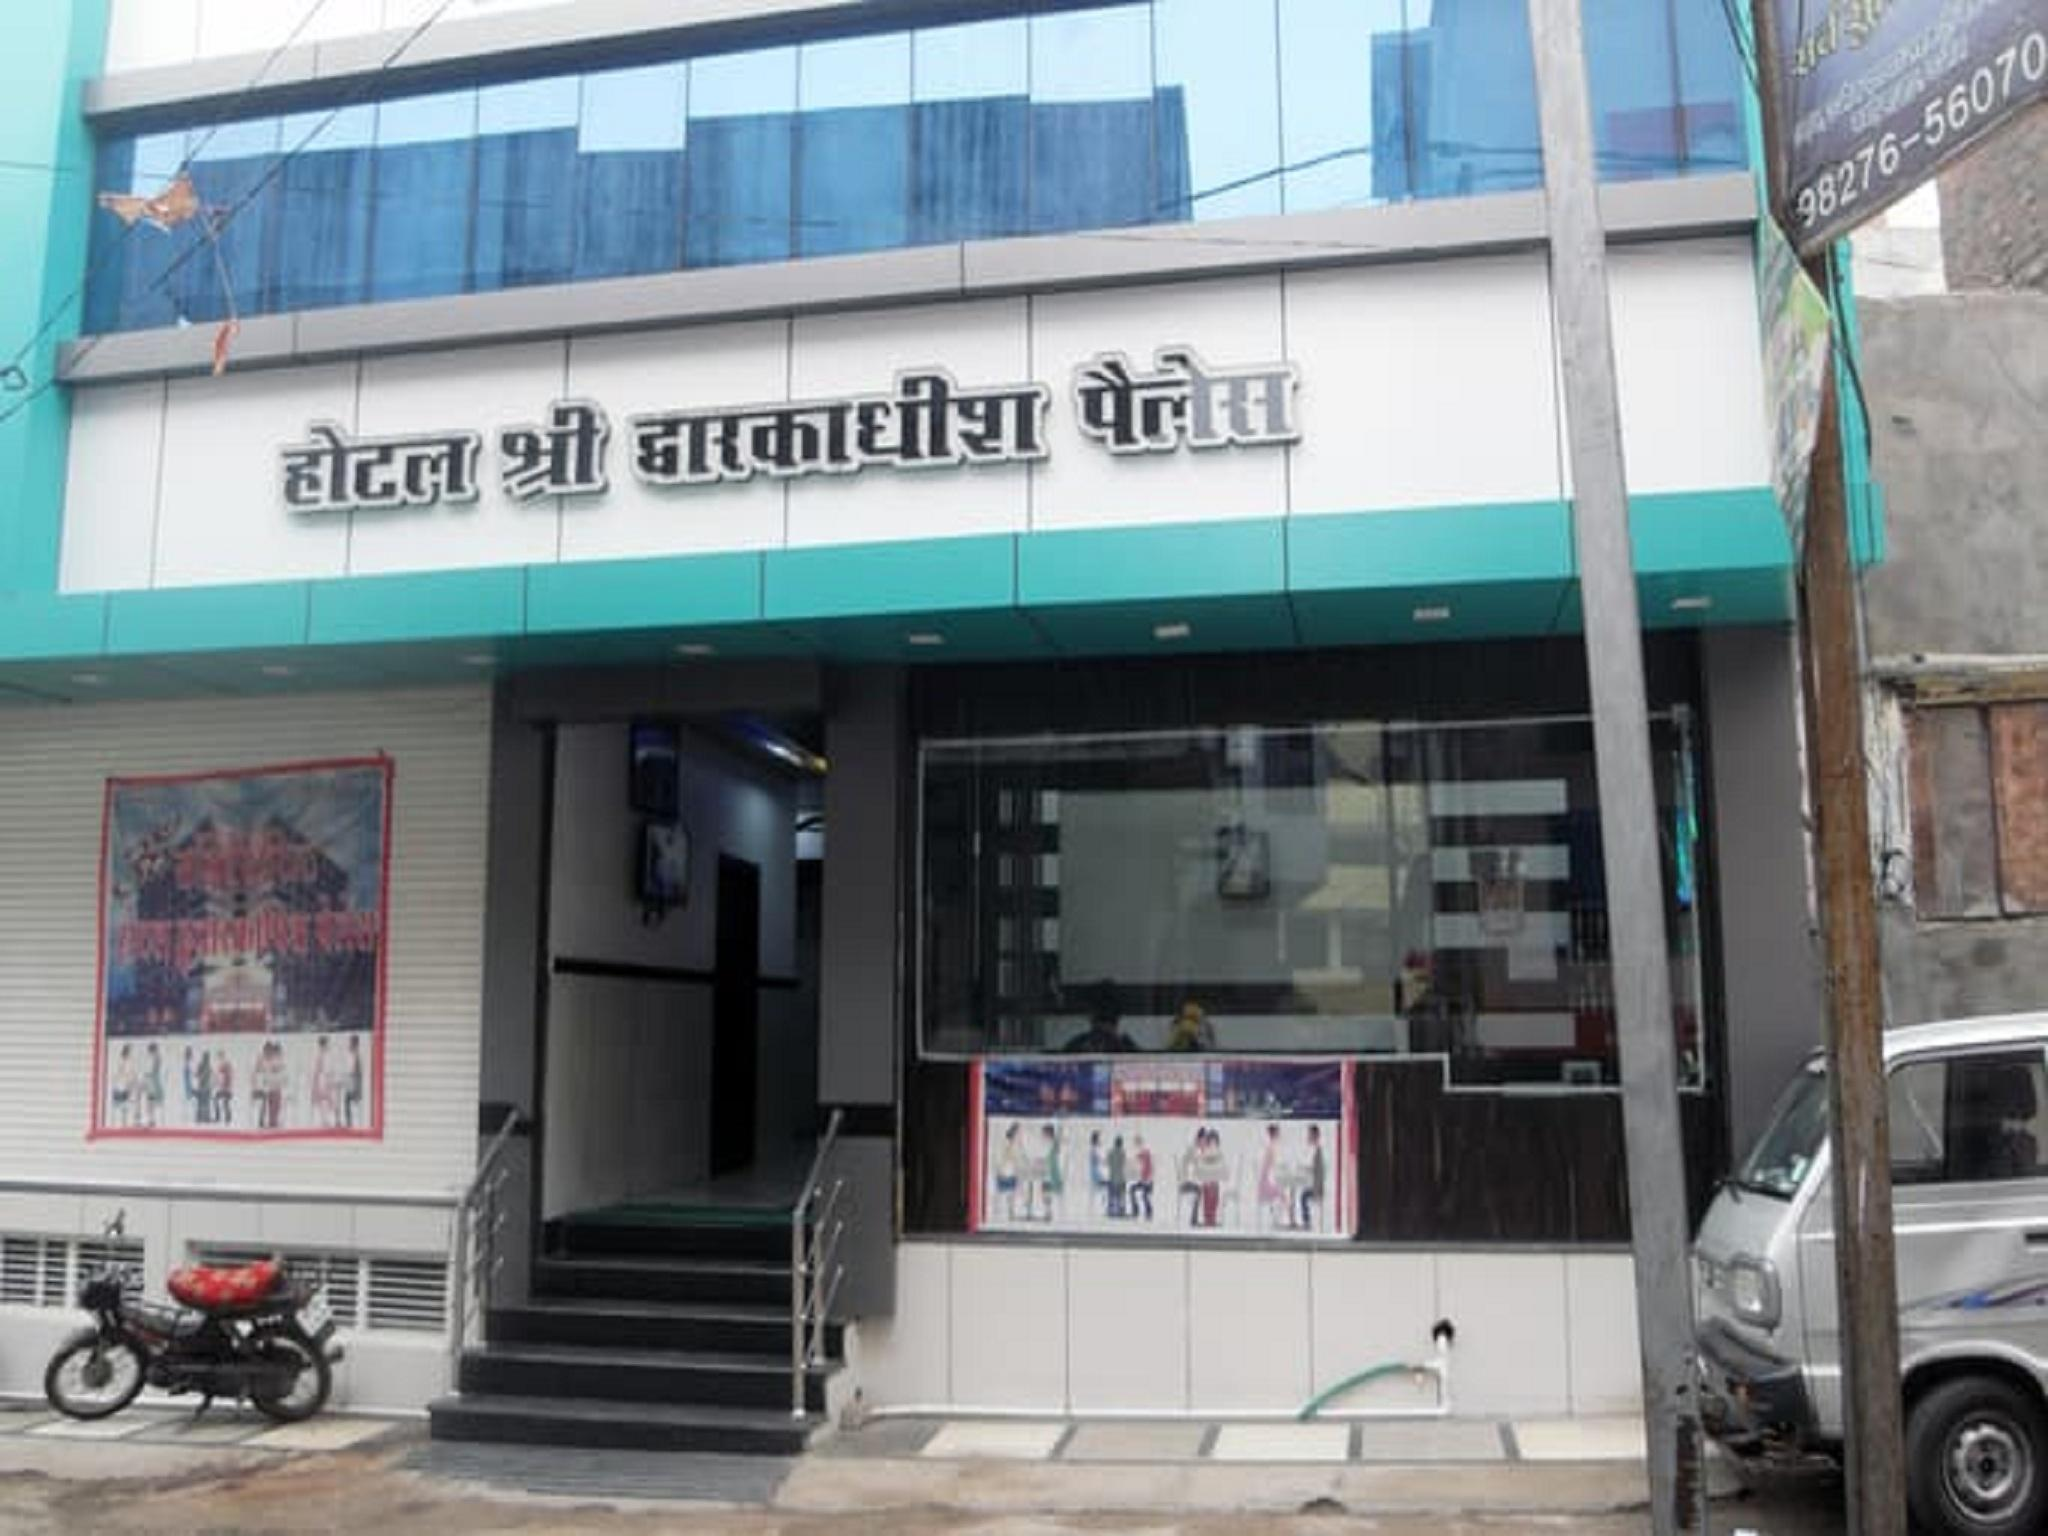 Hotel Shree Dwarkadhish Palace